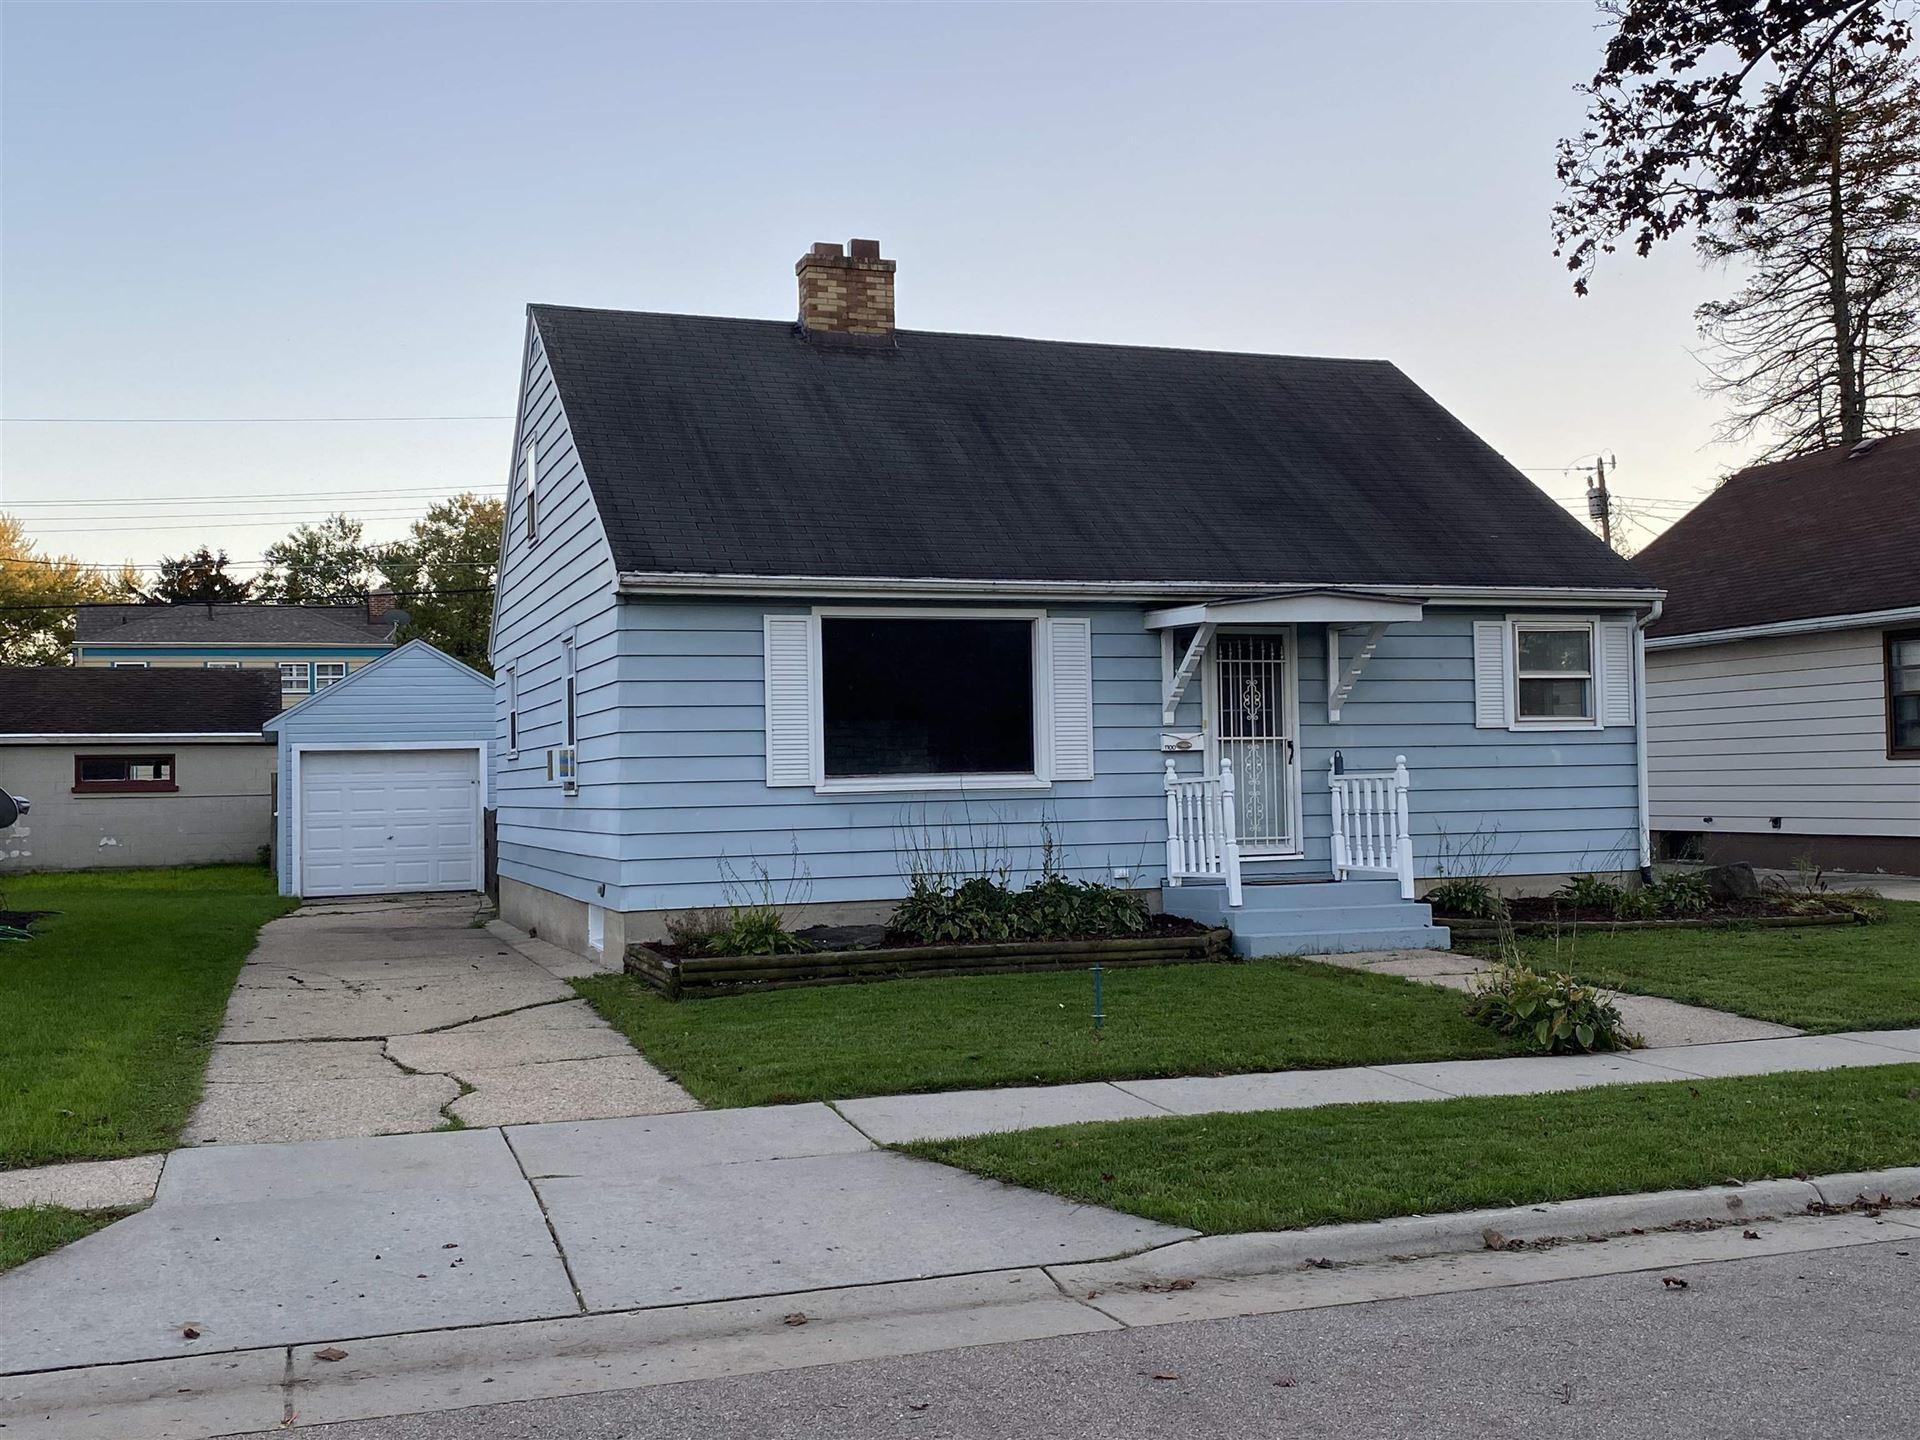 1100 Benton Ave, Janesville, WI 53545 - #: 1921959